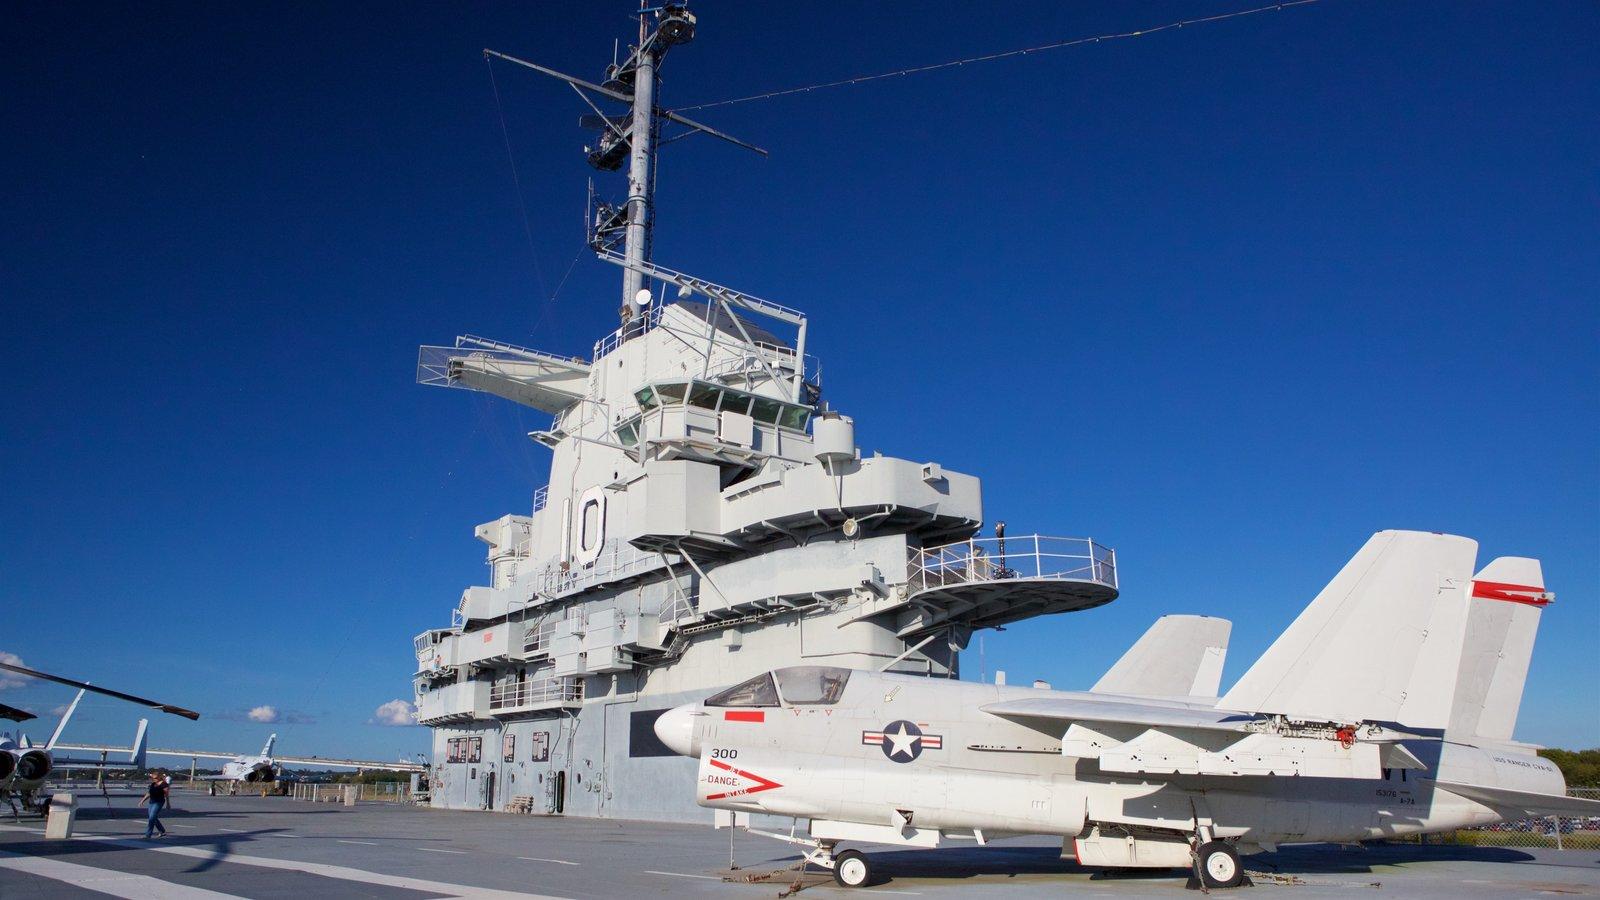 USS Yorktown caracterizando itens militares e aeronave